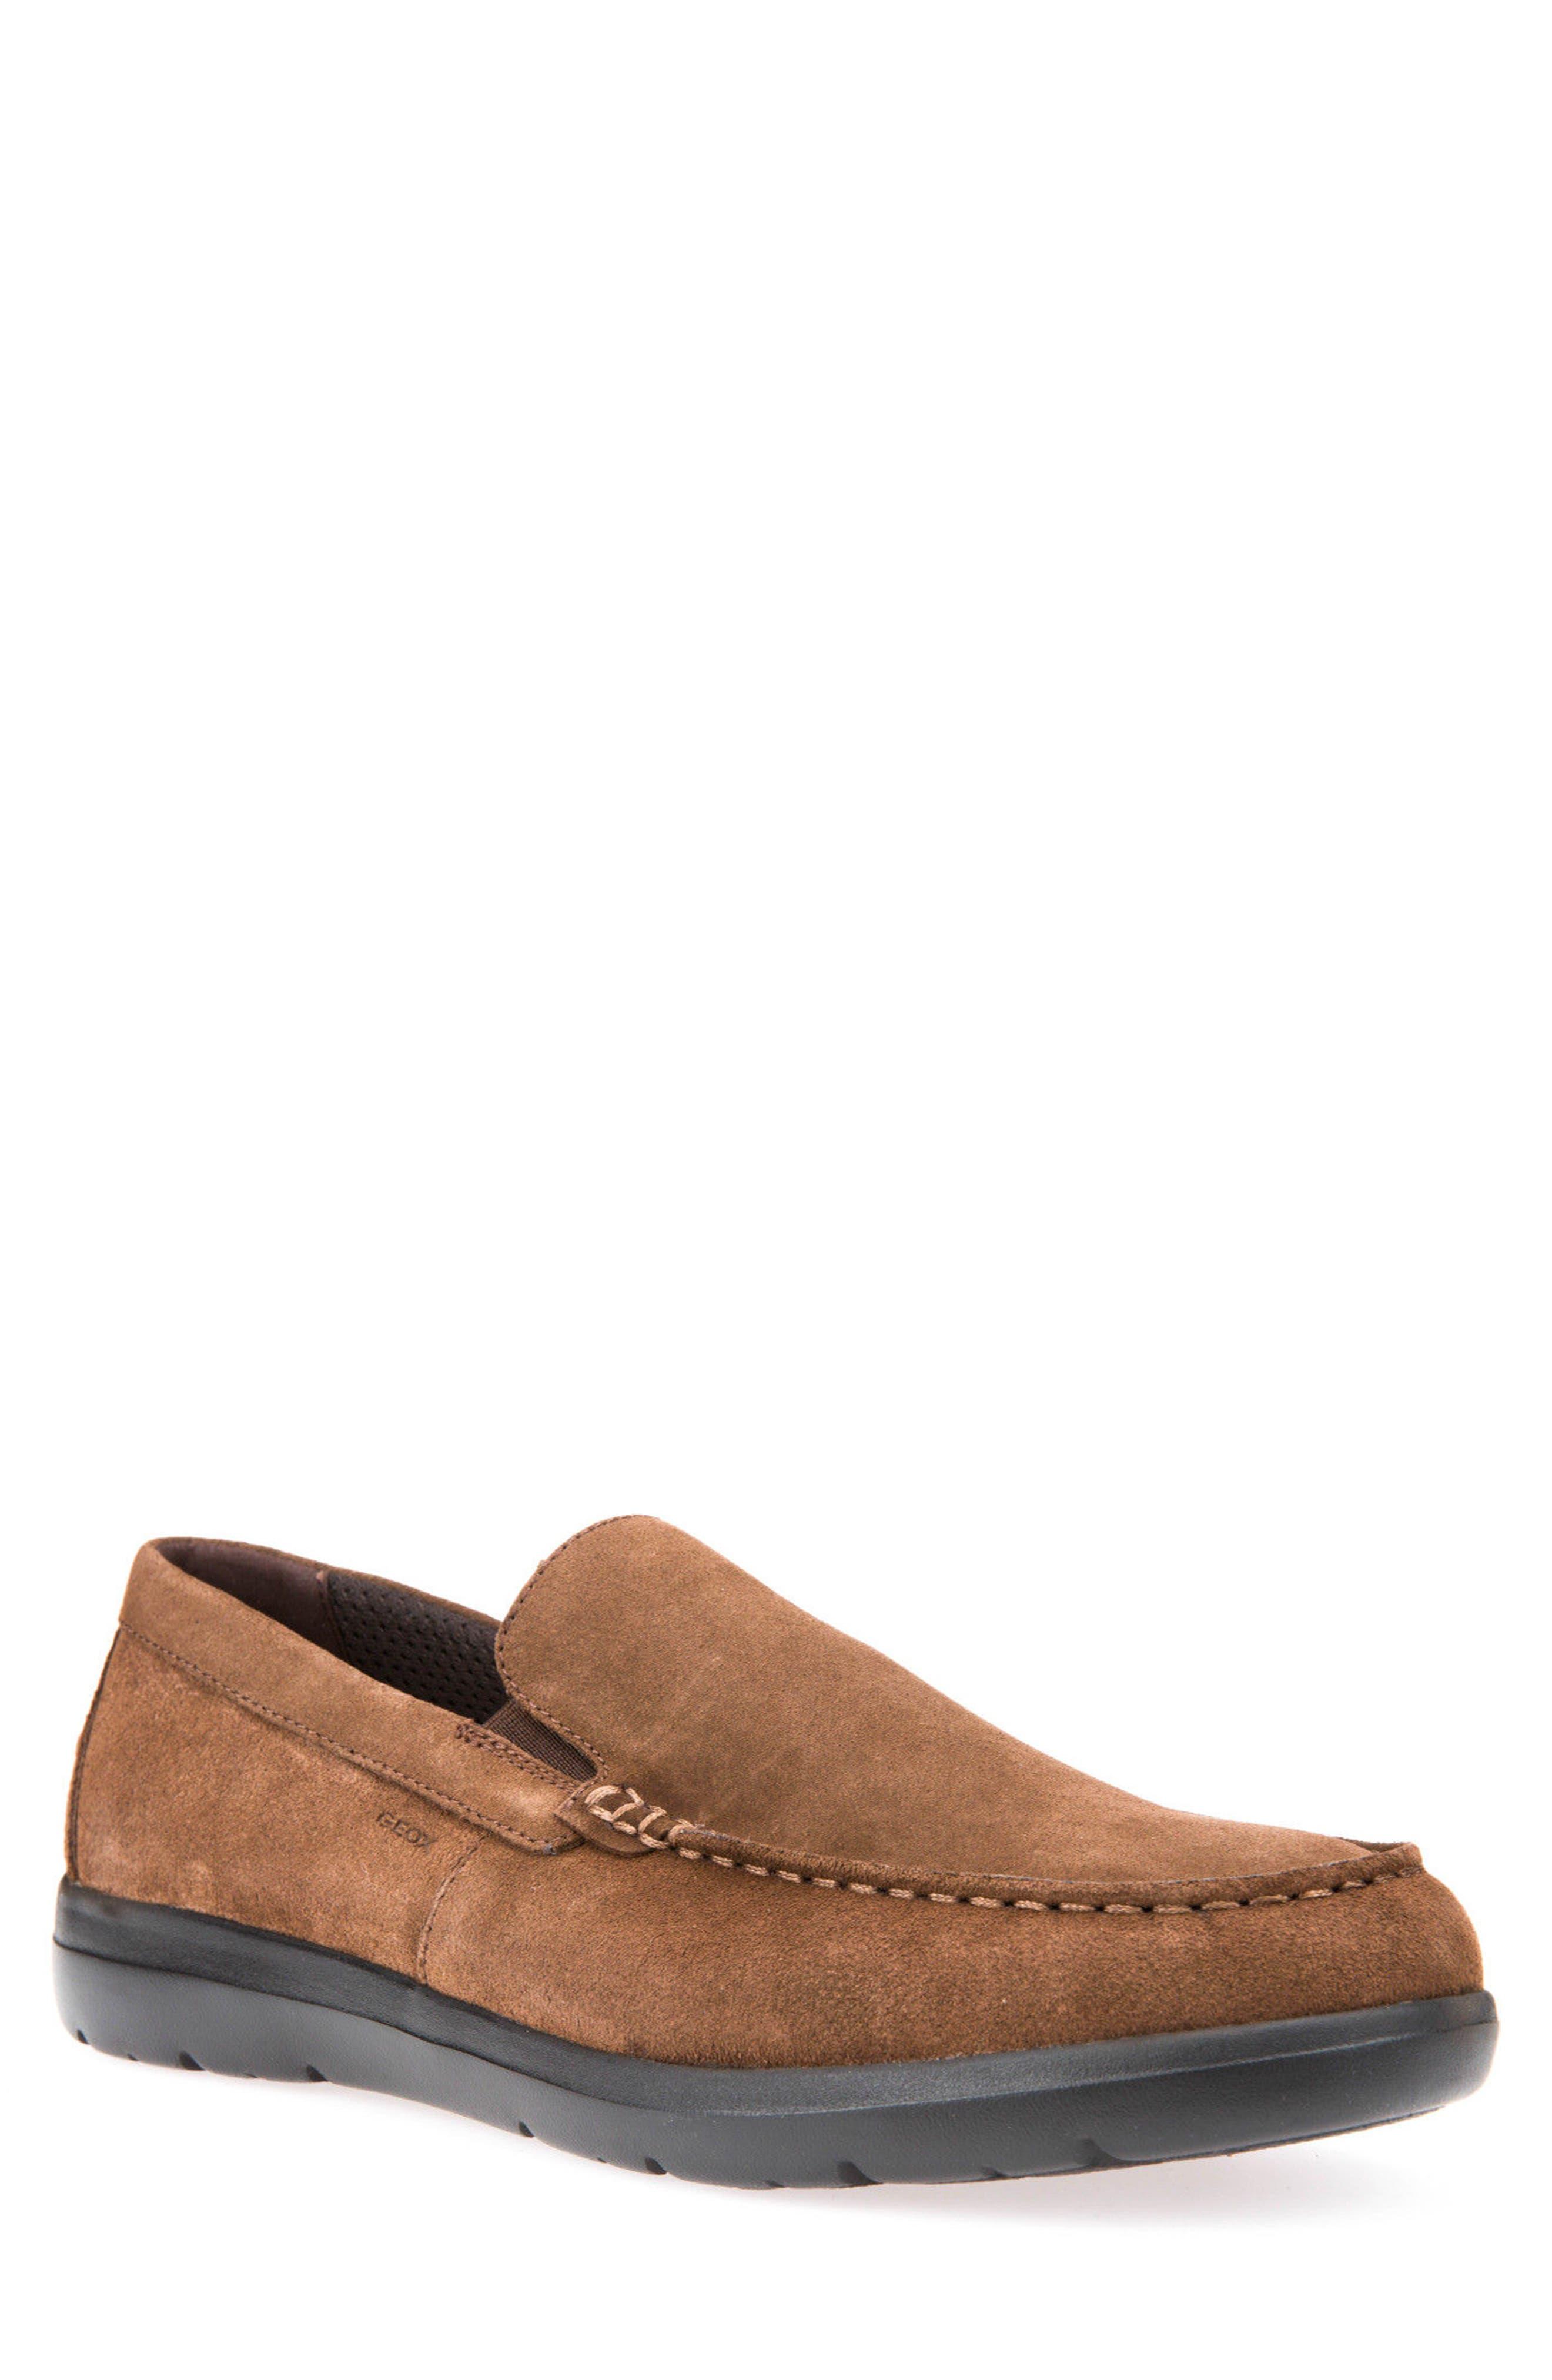 Geox Leitan 2 Loafer (Men)